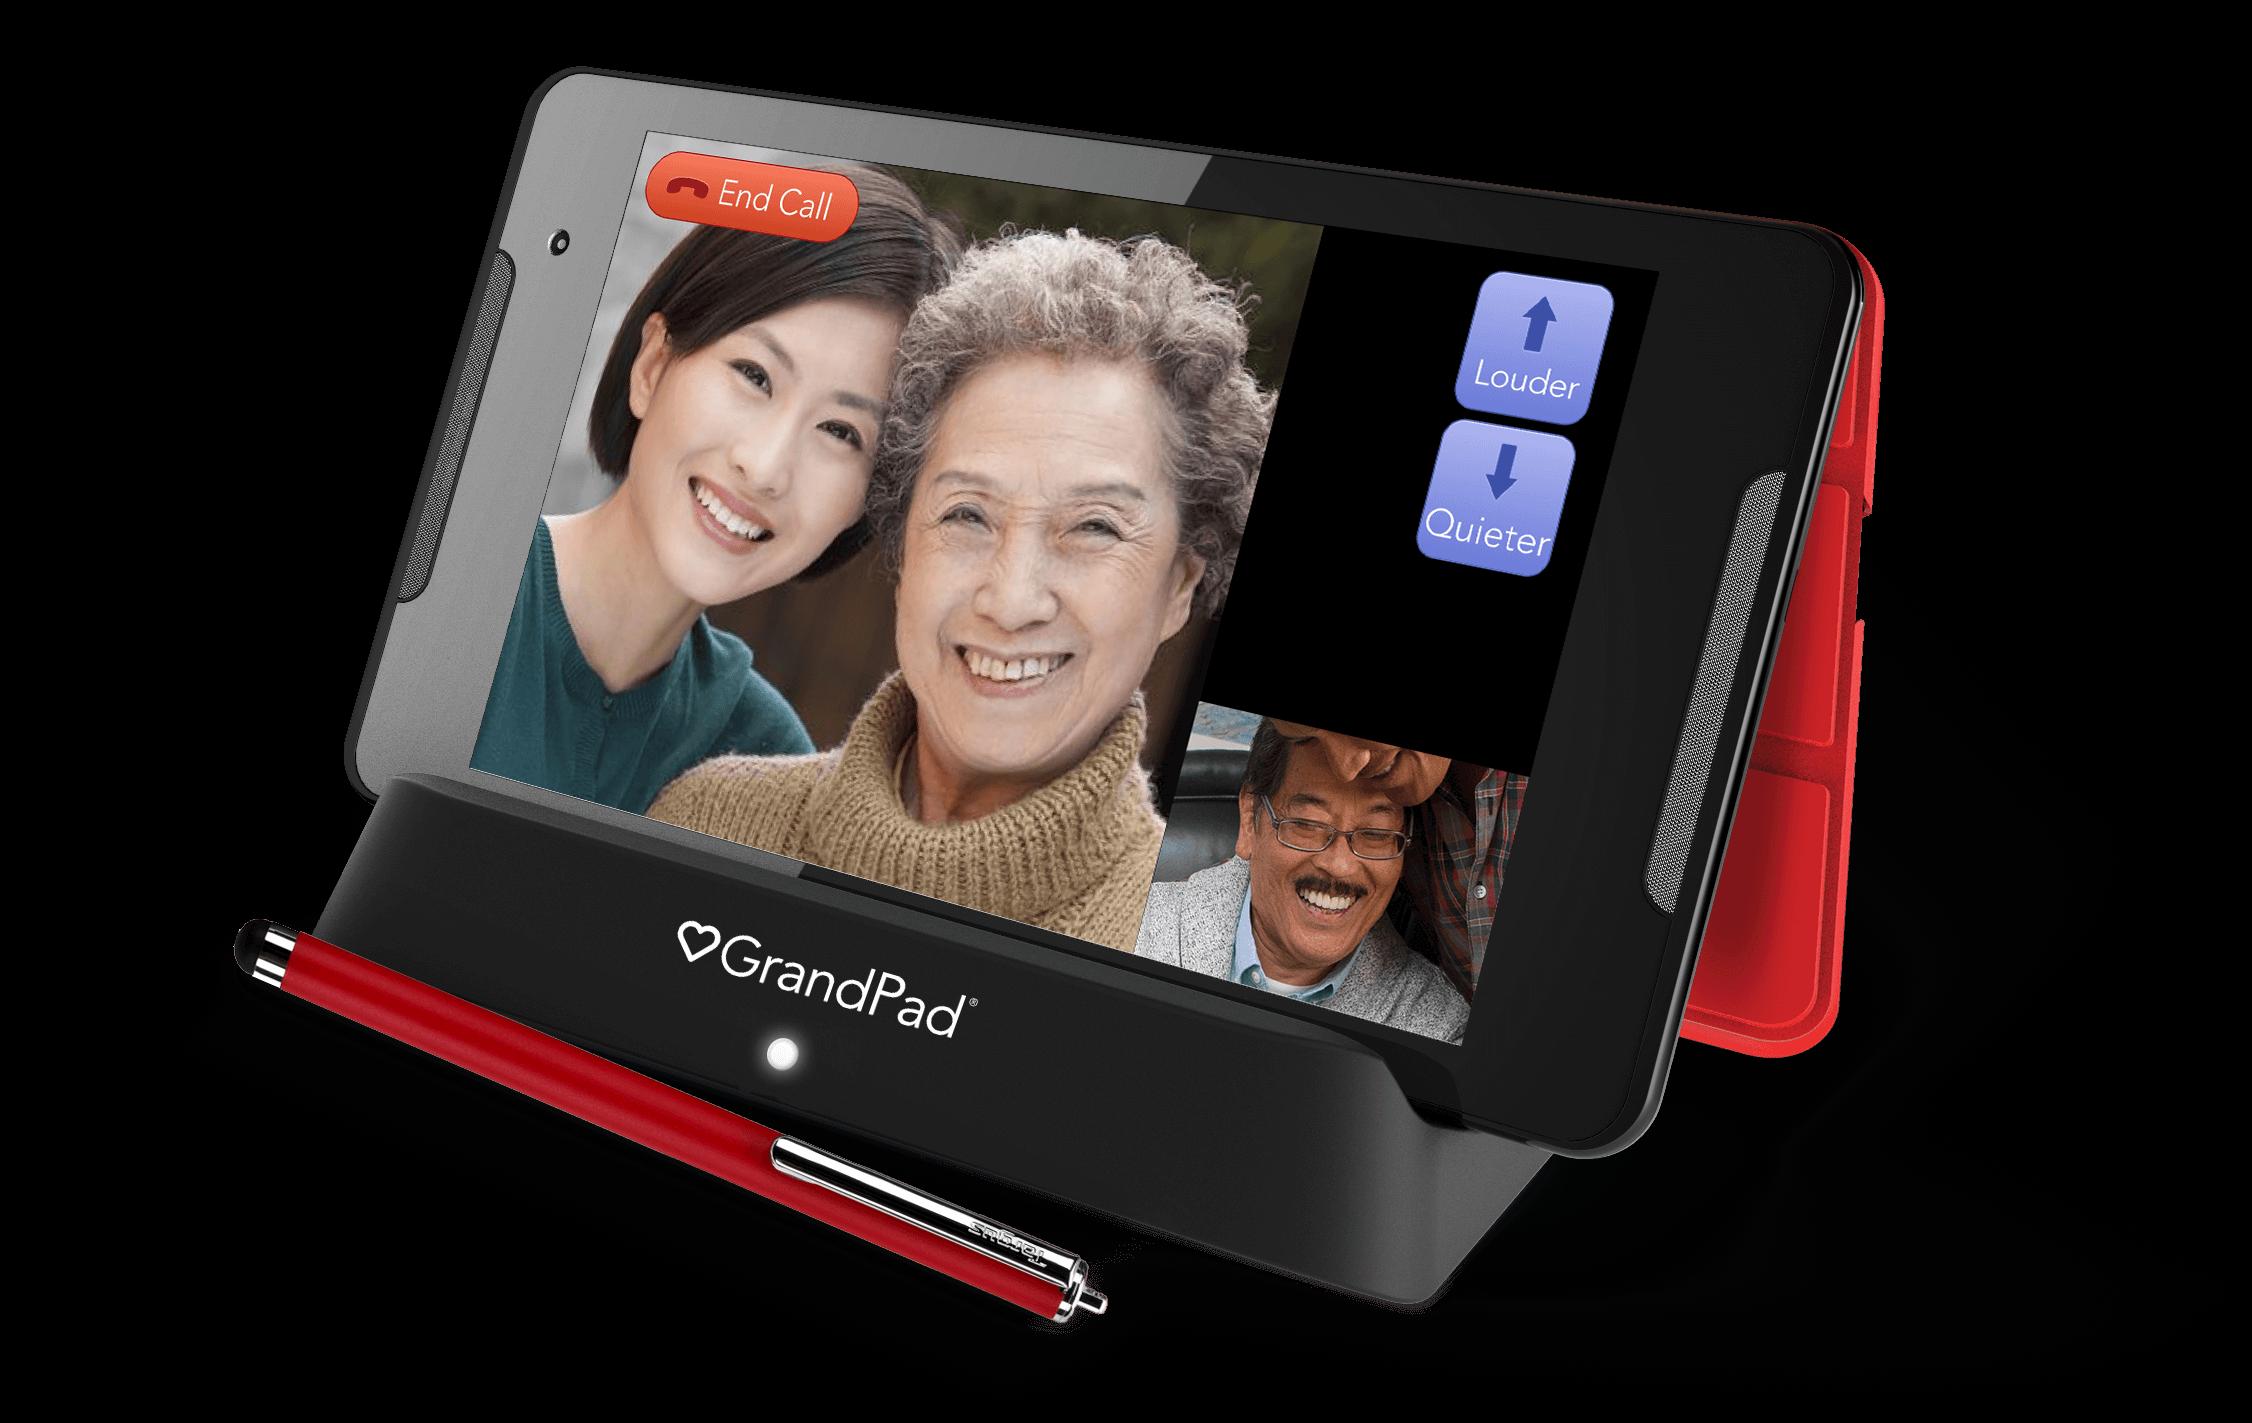 GrandPad Video call